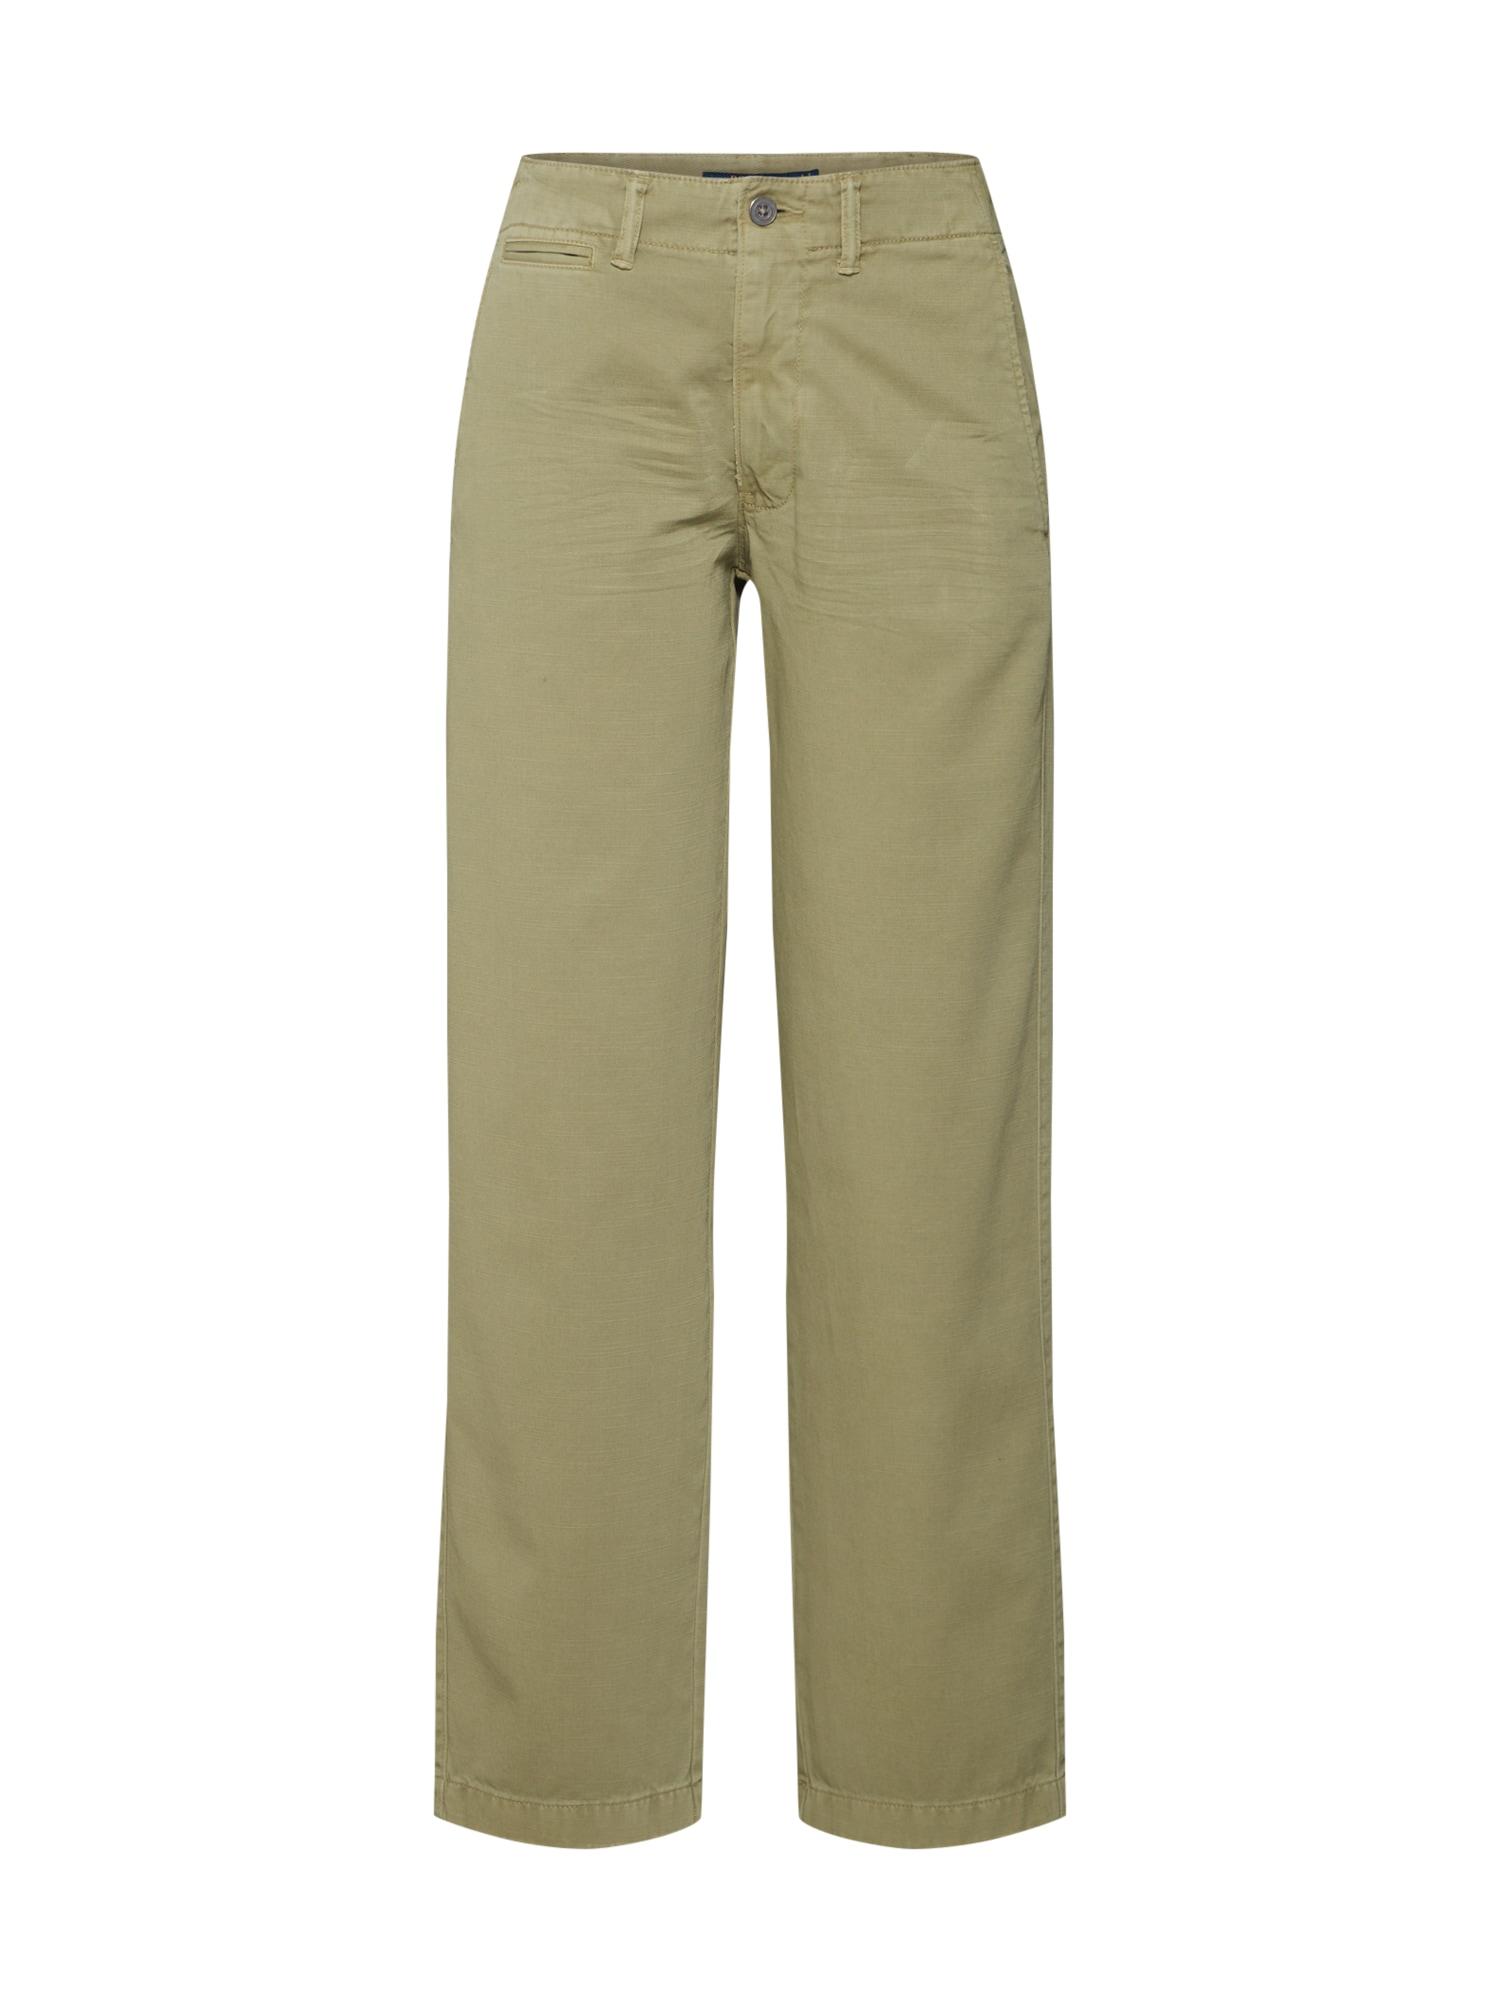 Kalhoty khaki POLO RALPH LAUREN